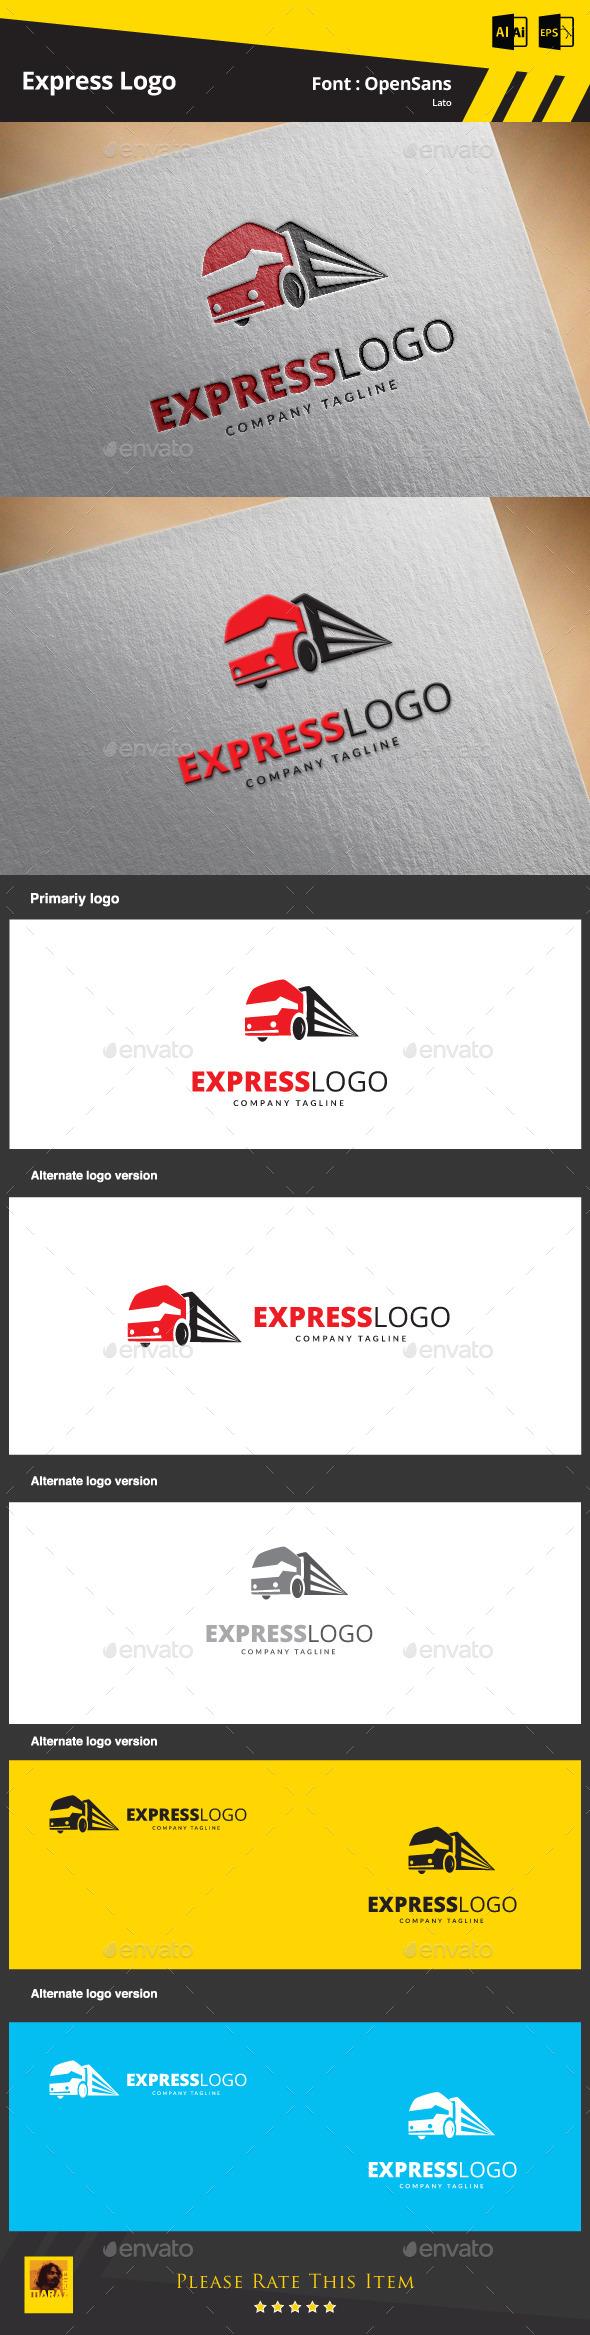 Express Logo Template